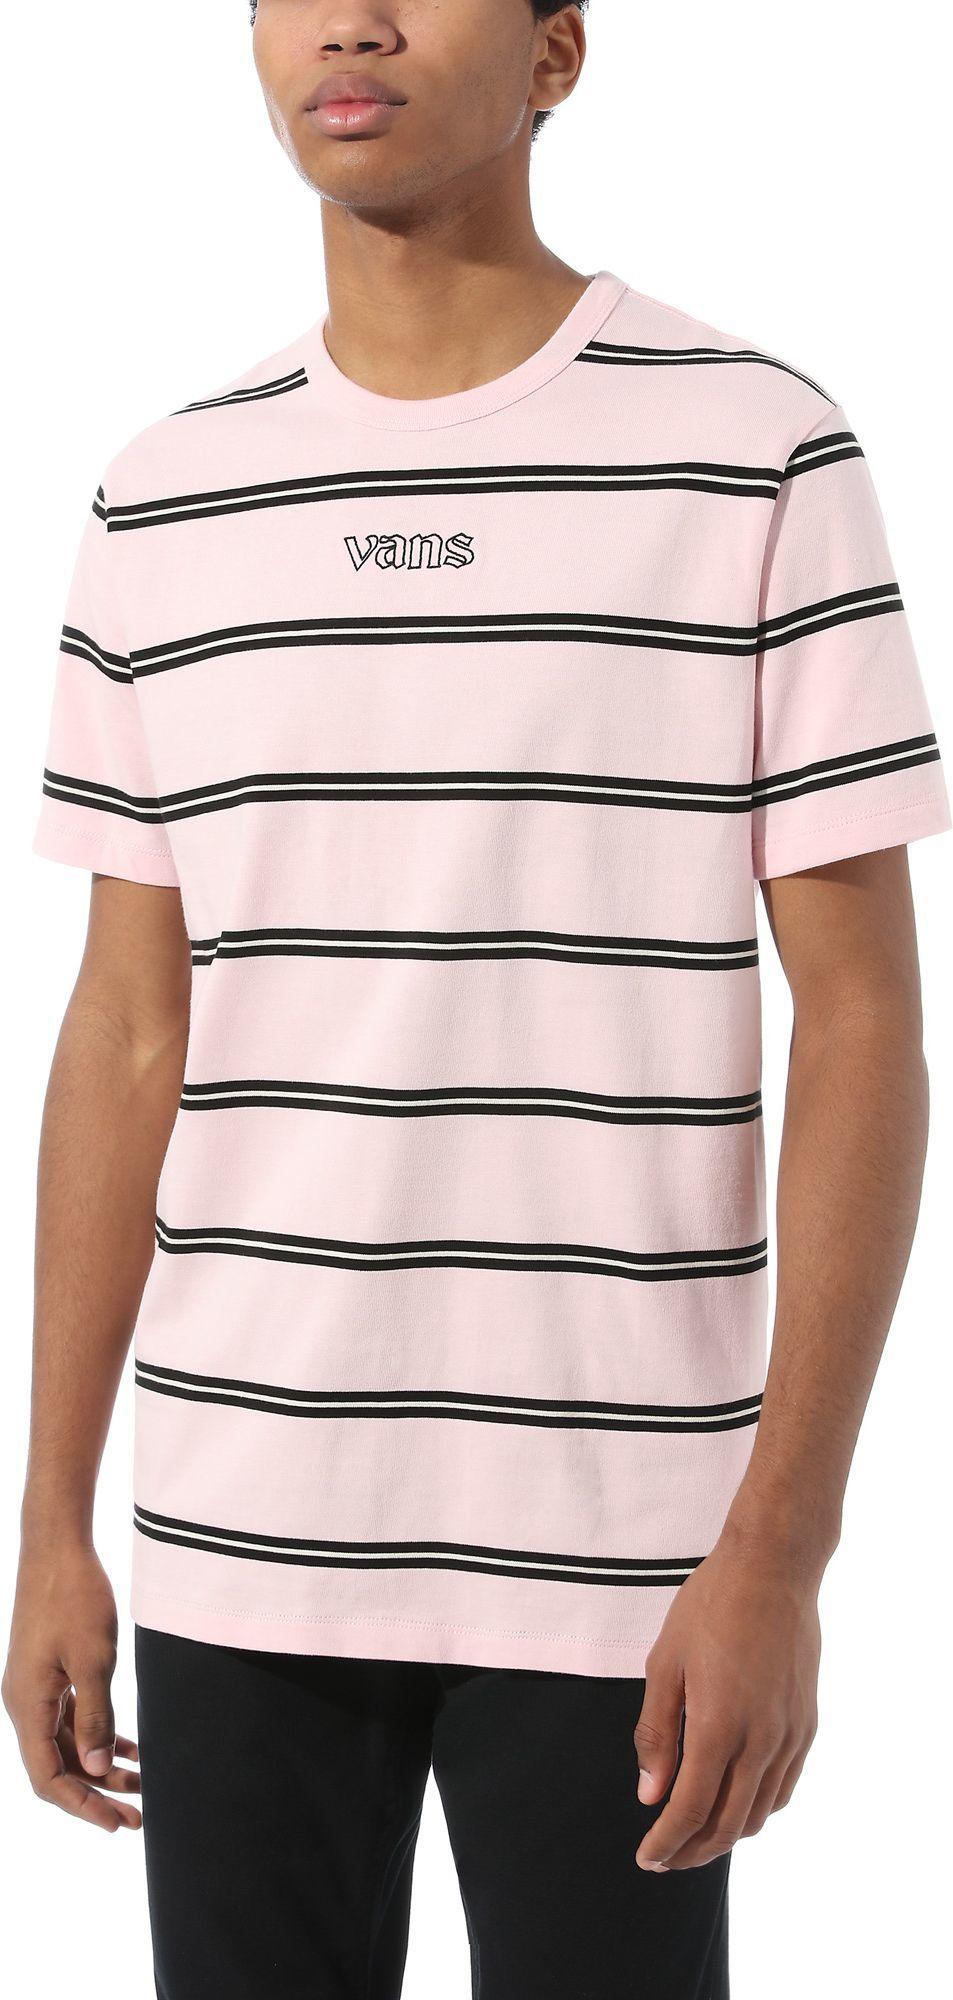 t-shirt męski VANS SIXTY SIXERS STRIPE SS Vans Cool Pink